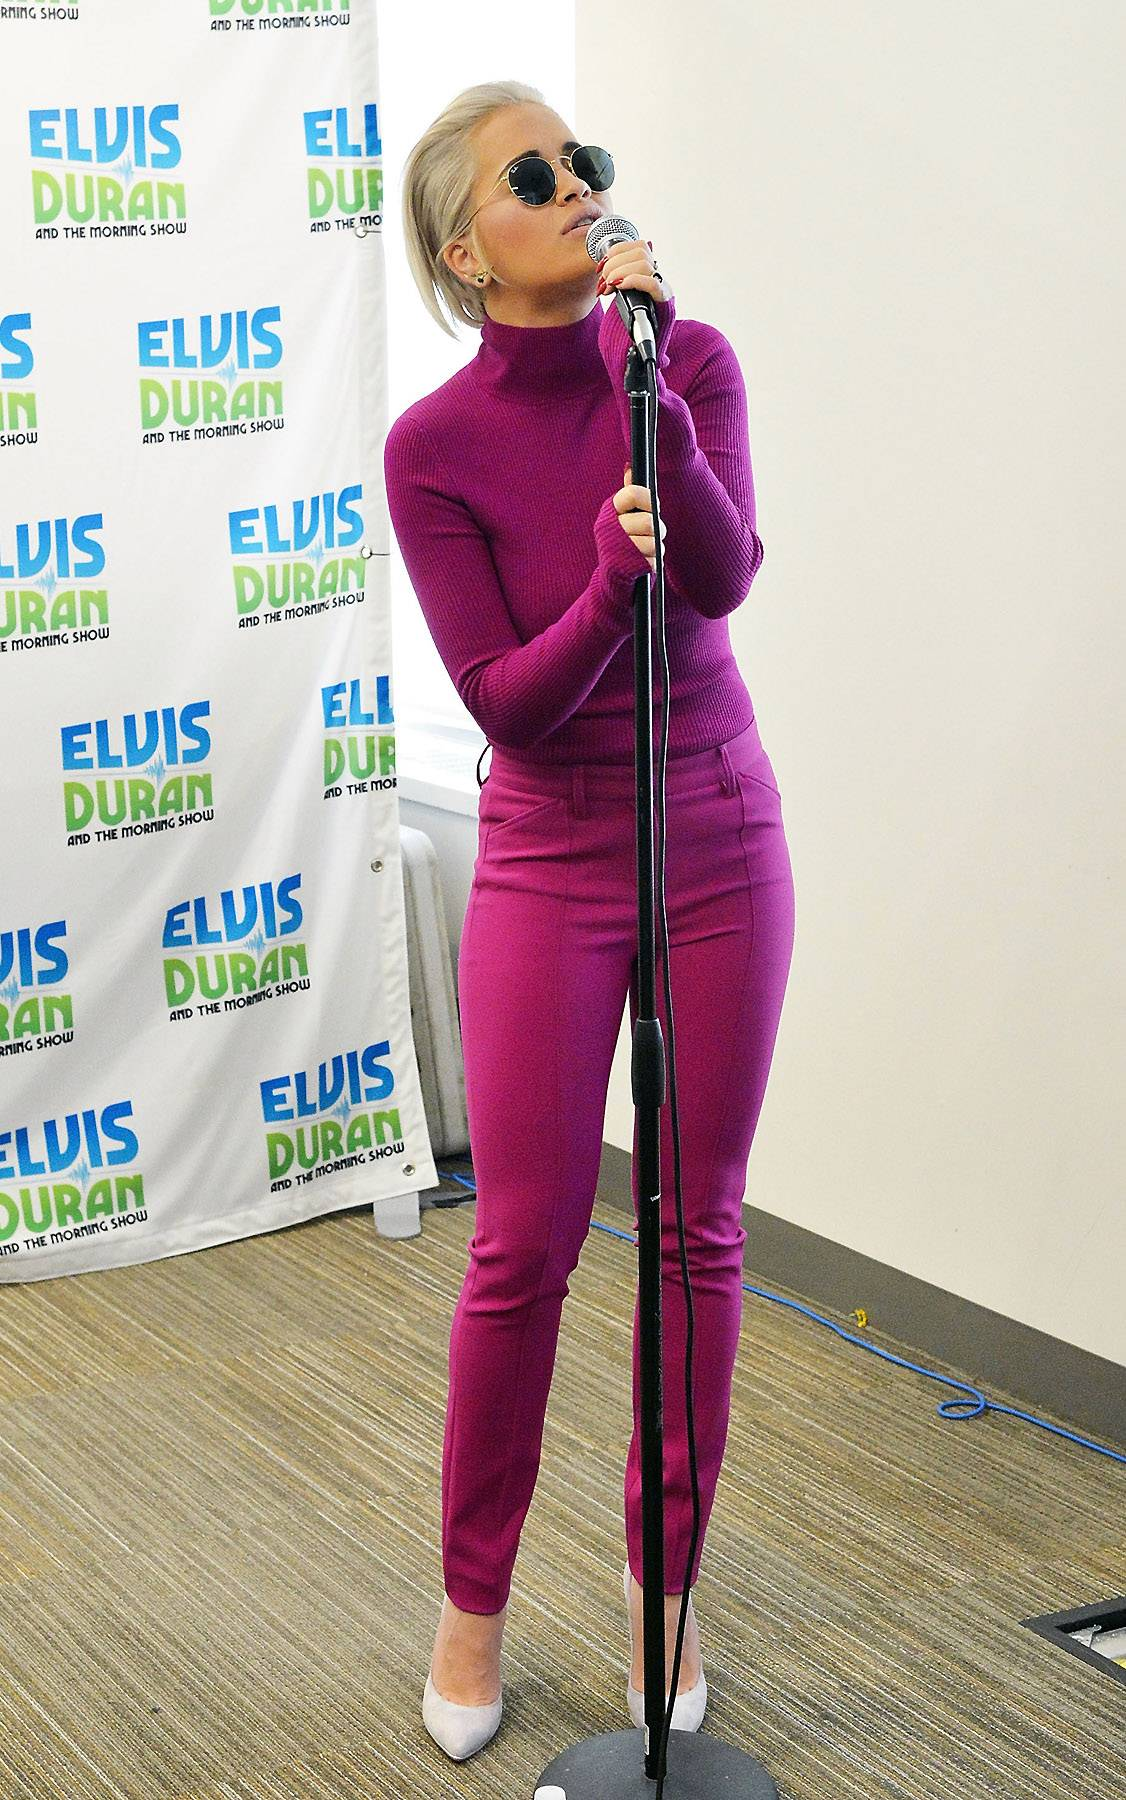 Yeah-Eeee-Yeah-Eeee-Yeah (a la Christina Aguilera) - Give us a little rock star vibe.   (Photo: Slaven Vlasic/Getty Images)